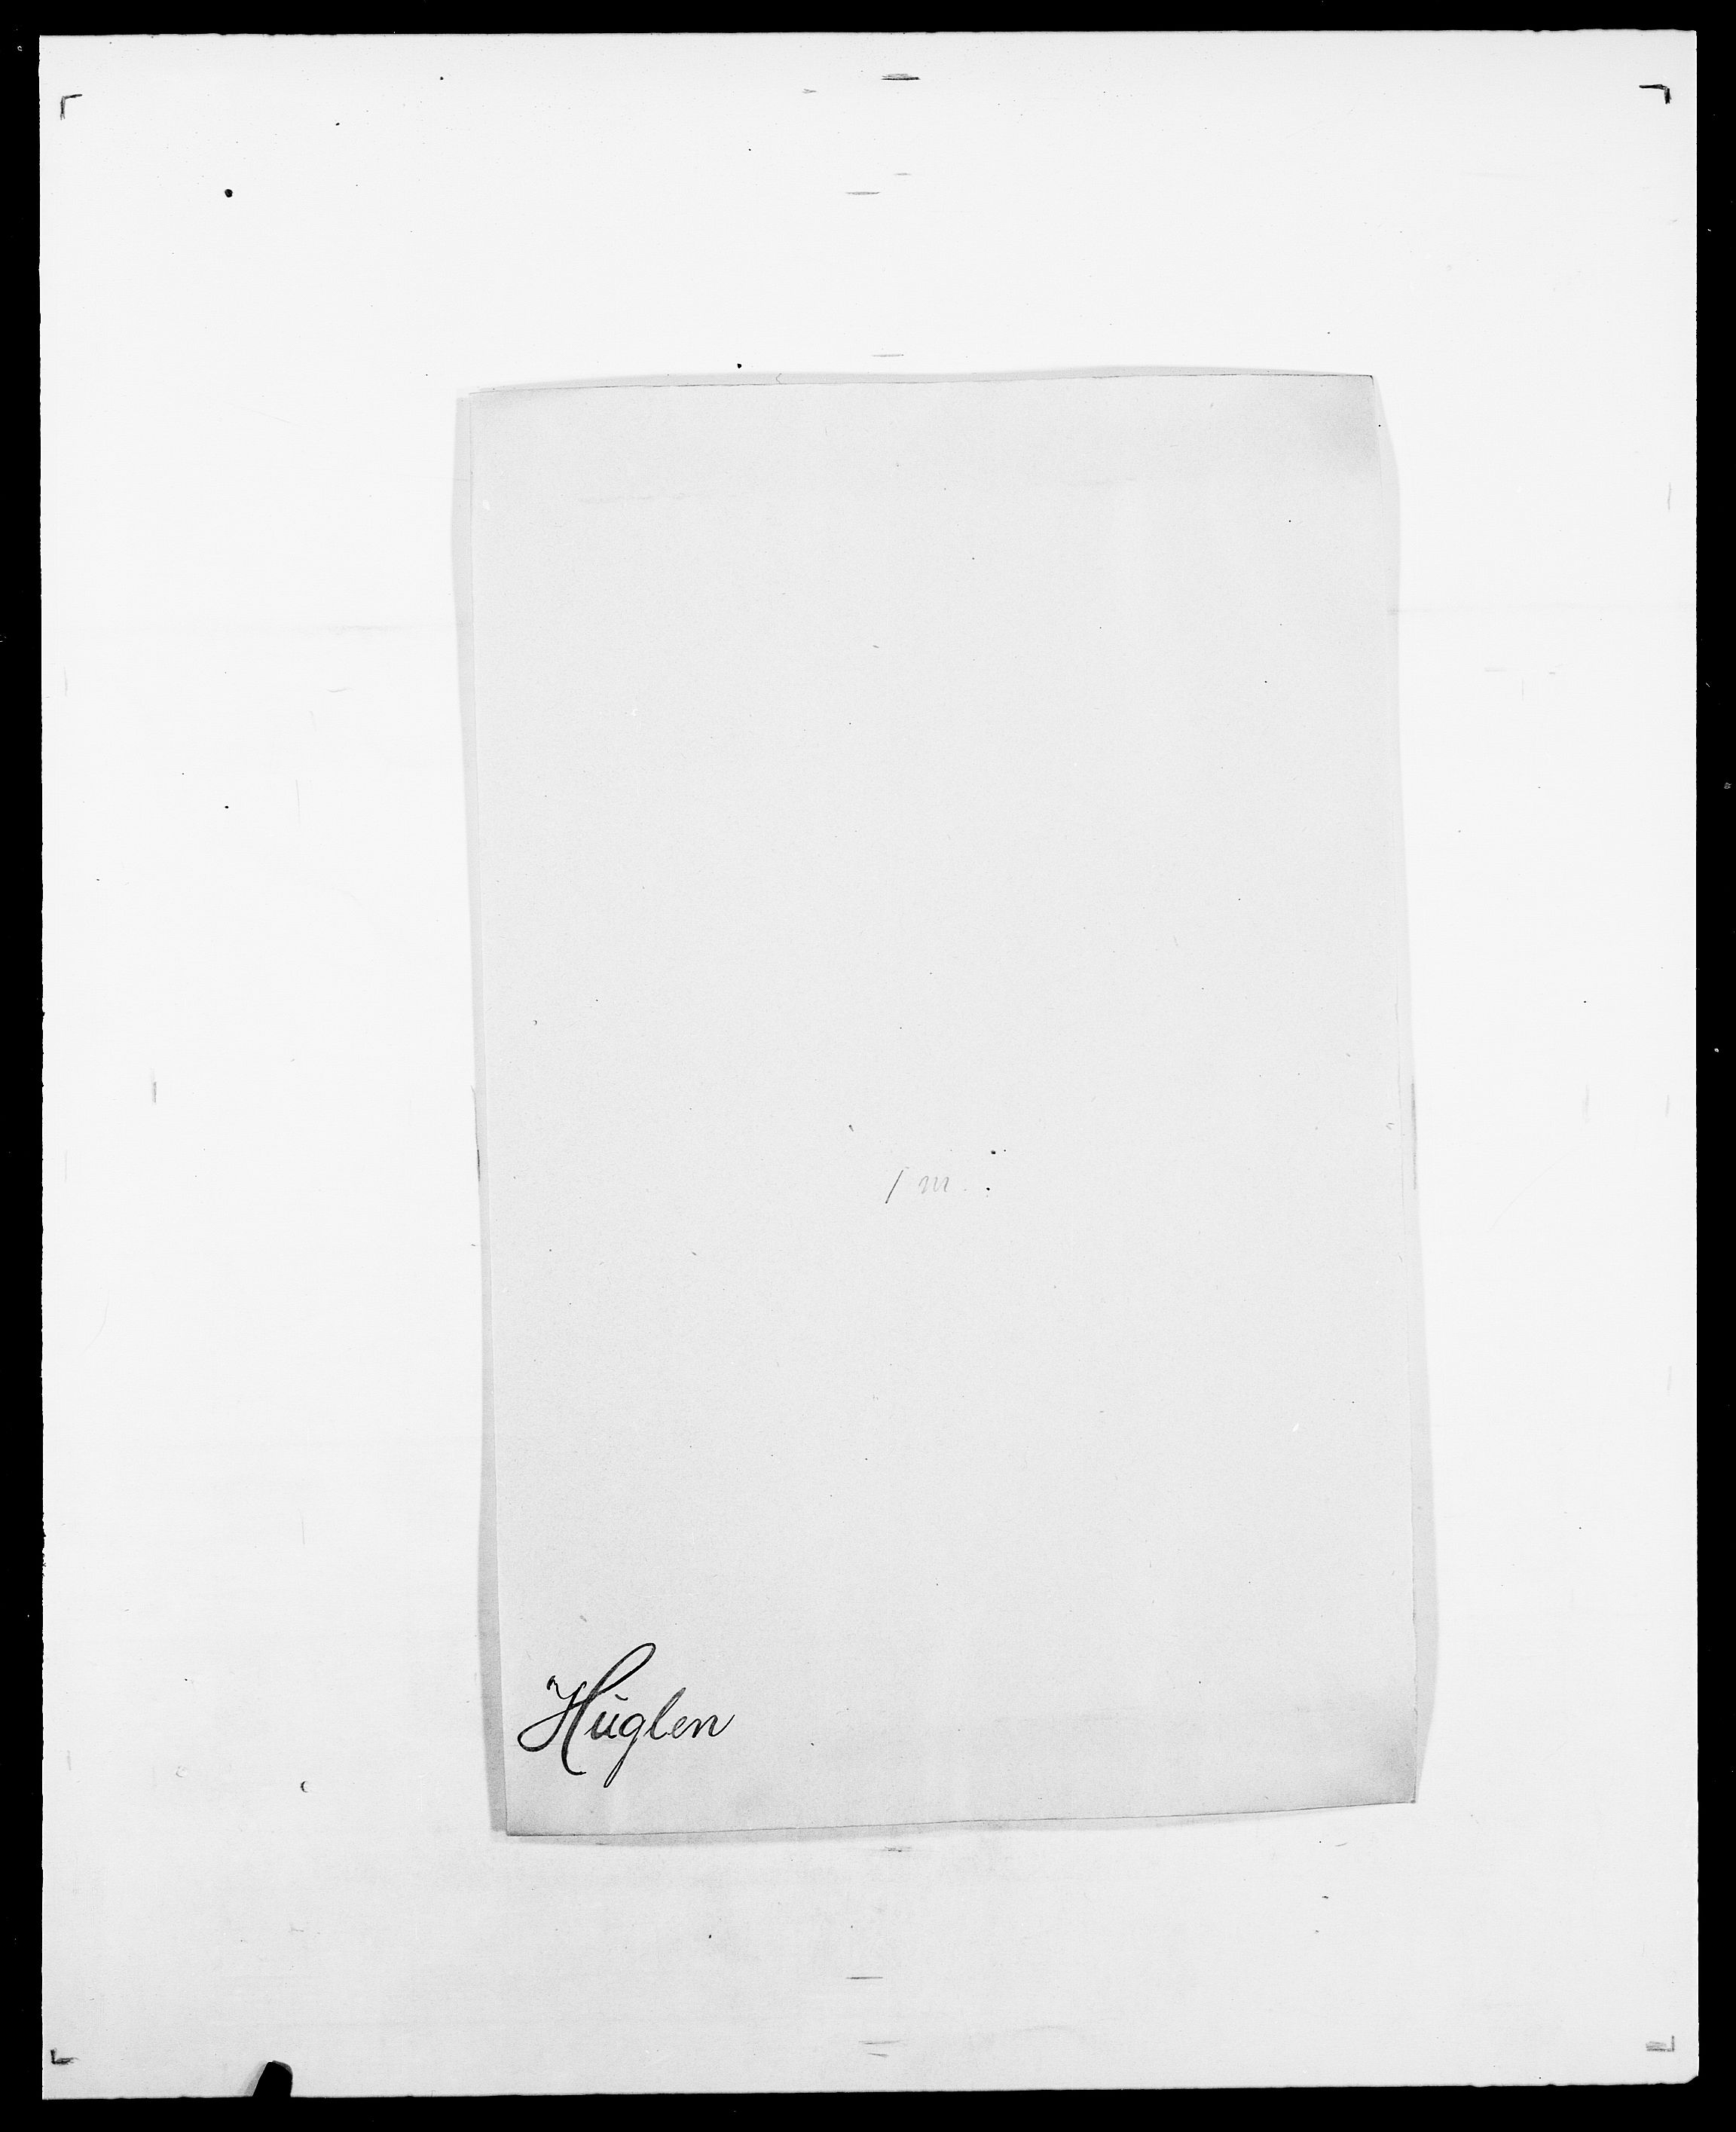 SAO, Delgobe, Charles Antoine - samling, D/Da/L0019: van der Hude - Joys, s. 32